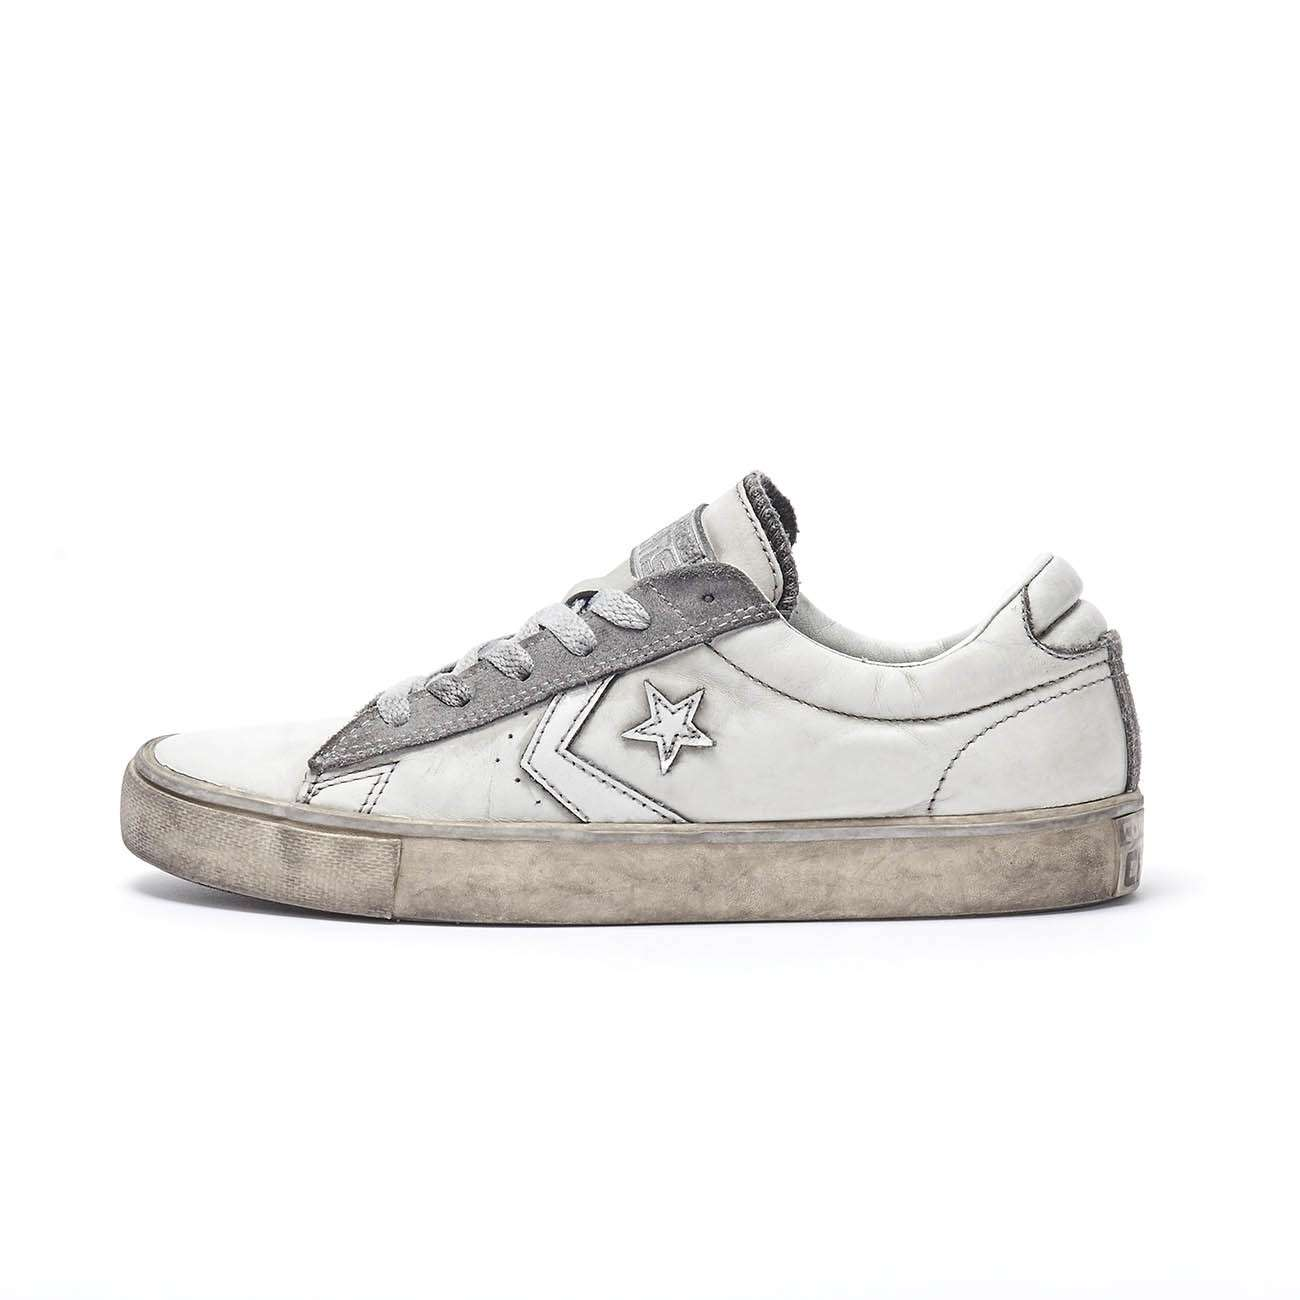 https://www.parmax.com/media/catalog/product/a/i/AI-outlet_parmax-scarpe-uomo-Converse-158573C-C.jpg